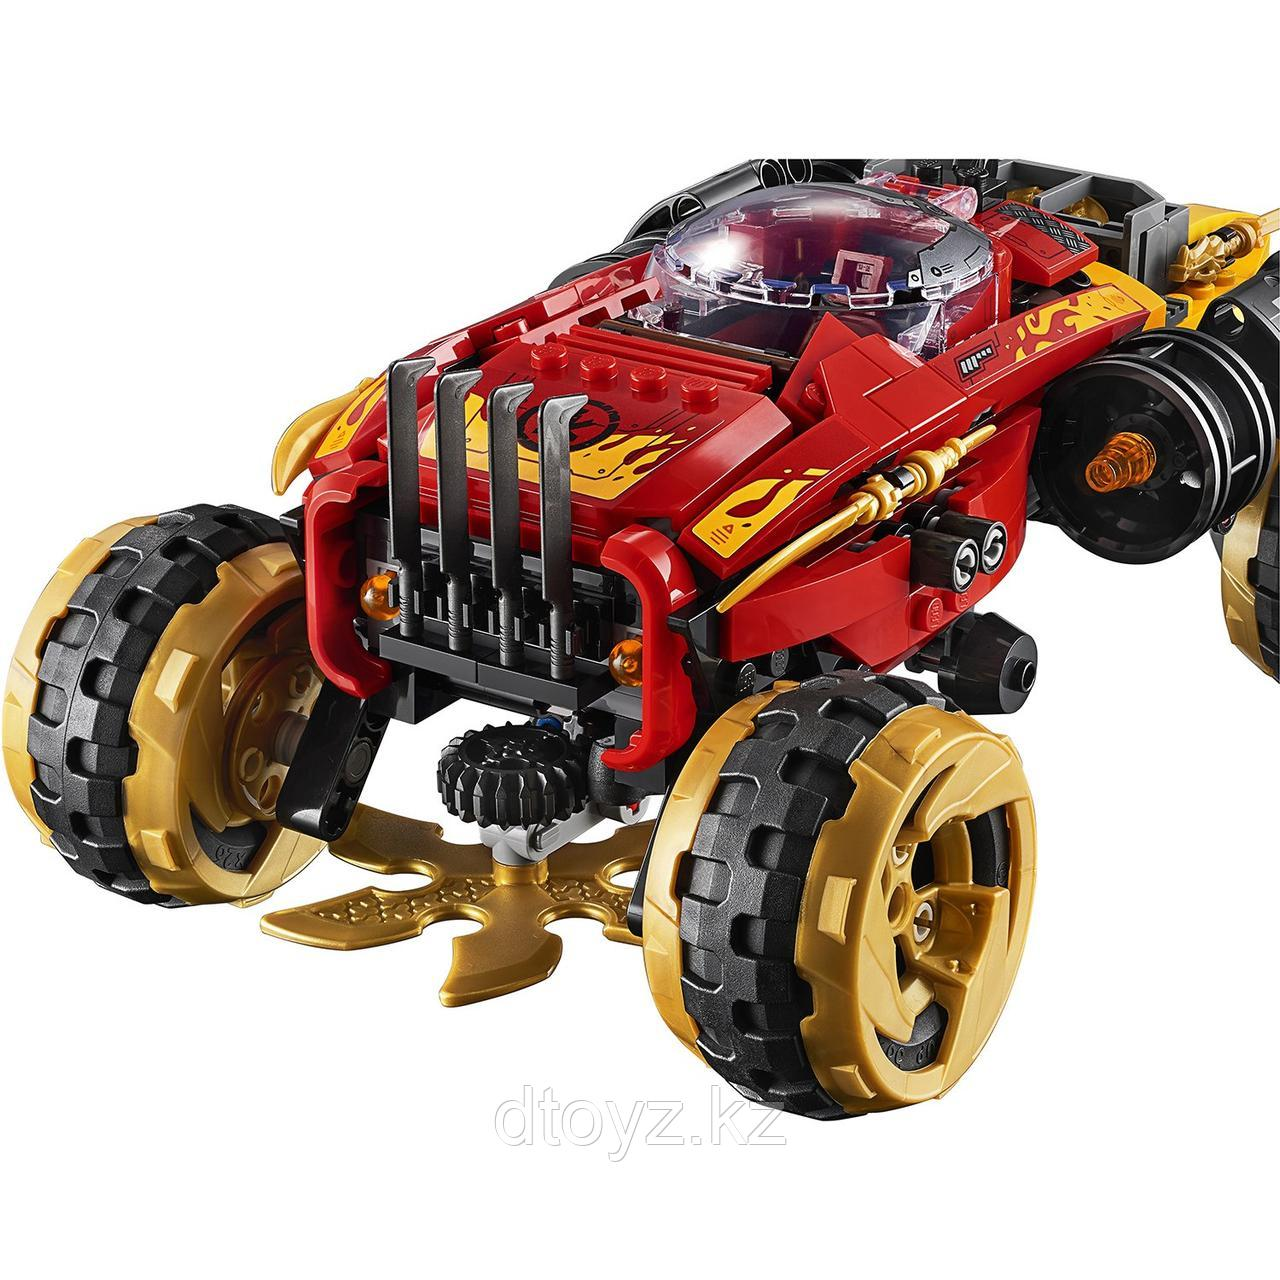 Lego Ninjago 70675 Внедорожник Катана 4x4, Лего Ниндзяго - фото 6